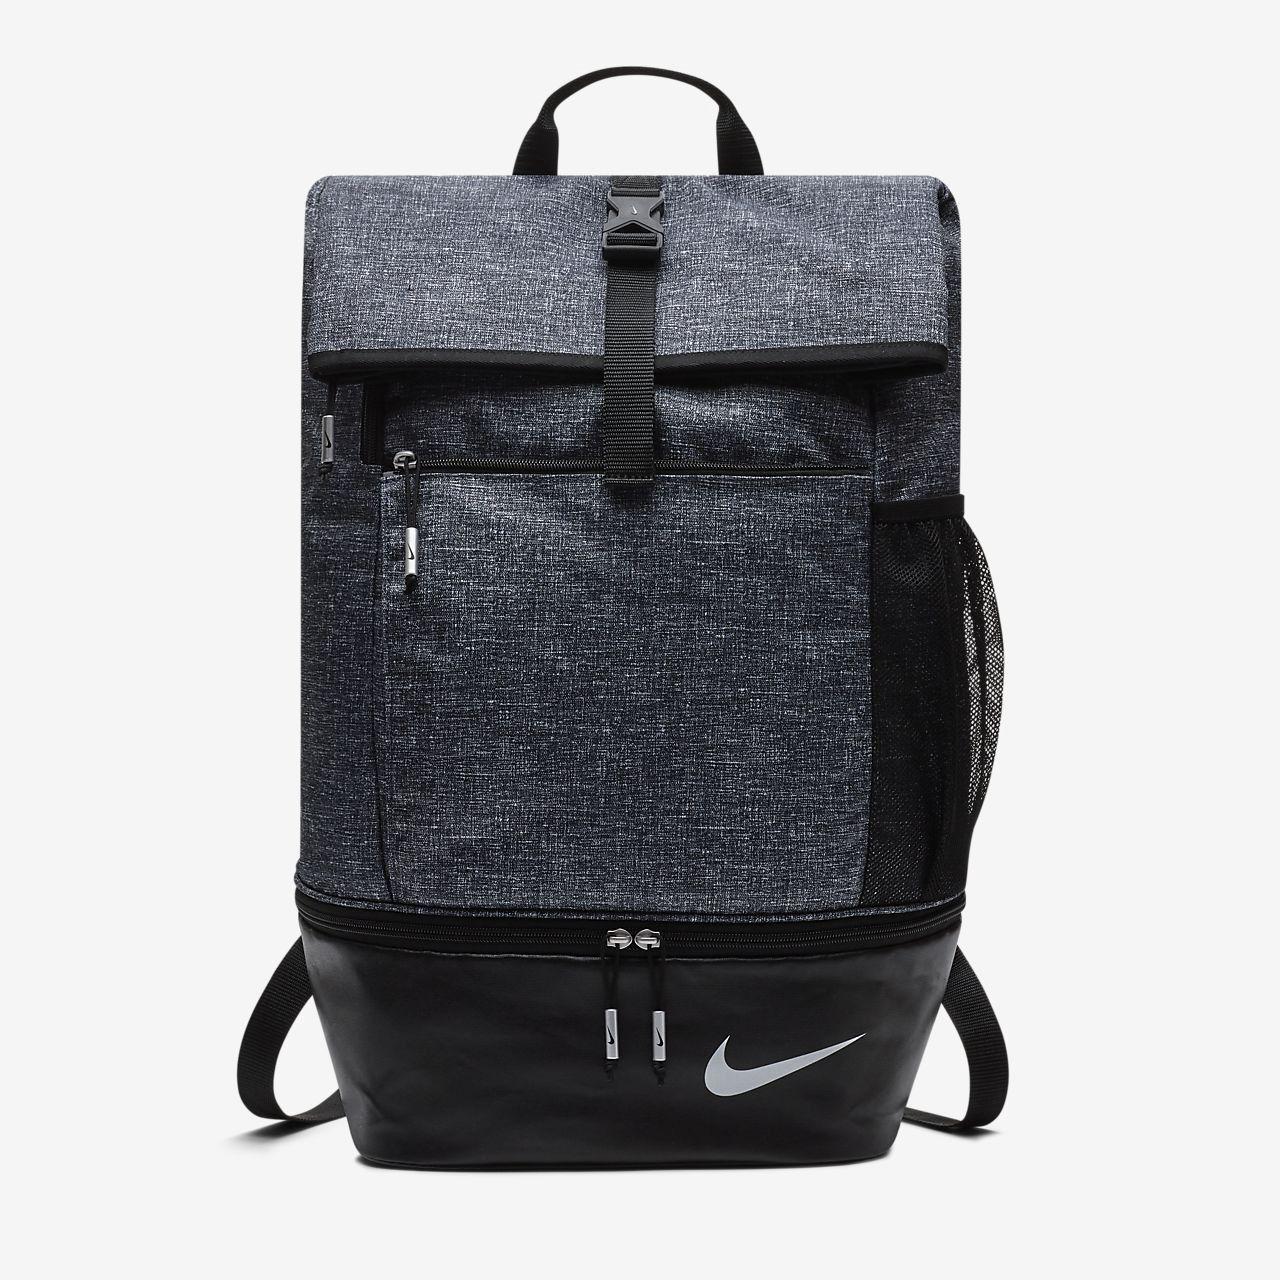 Nike Sport Backpack One Size Thunder Blue/Black Nike